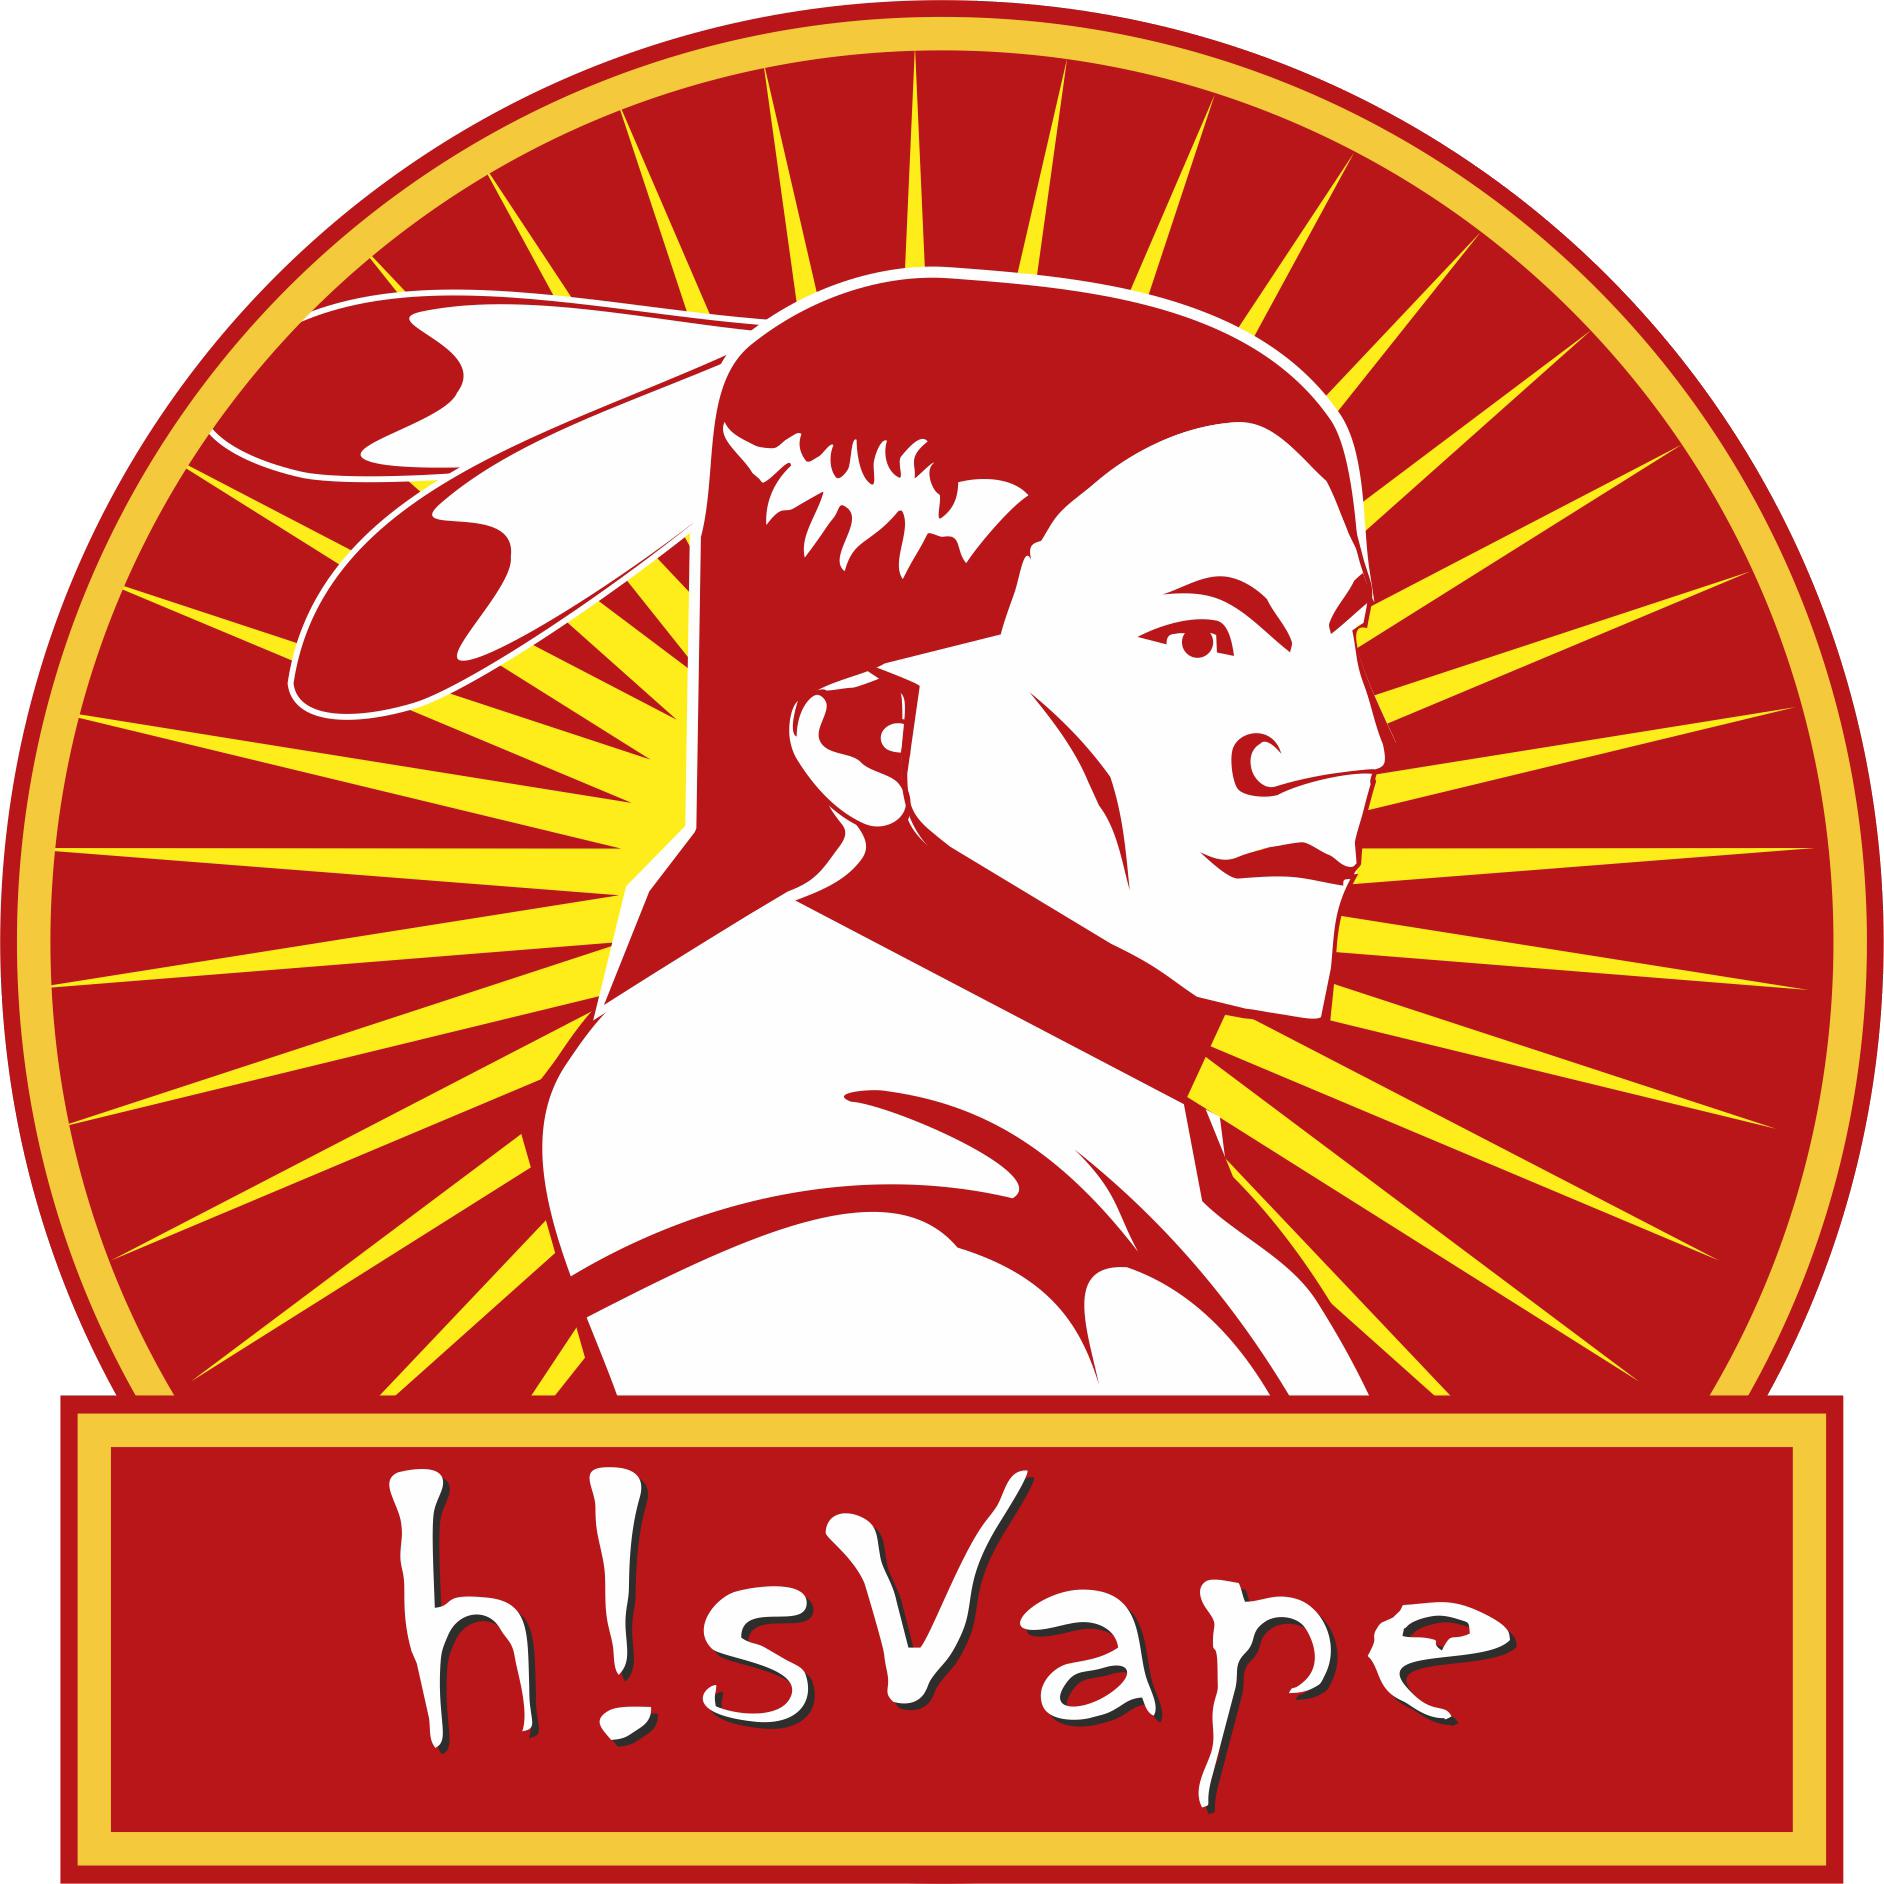 hisVape